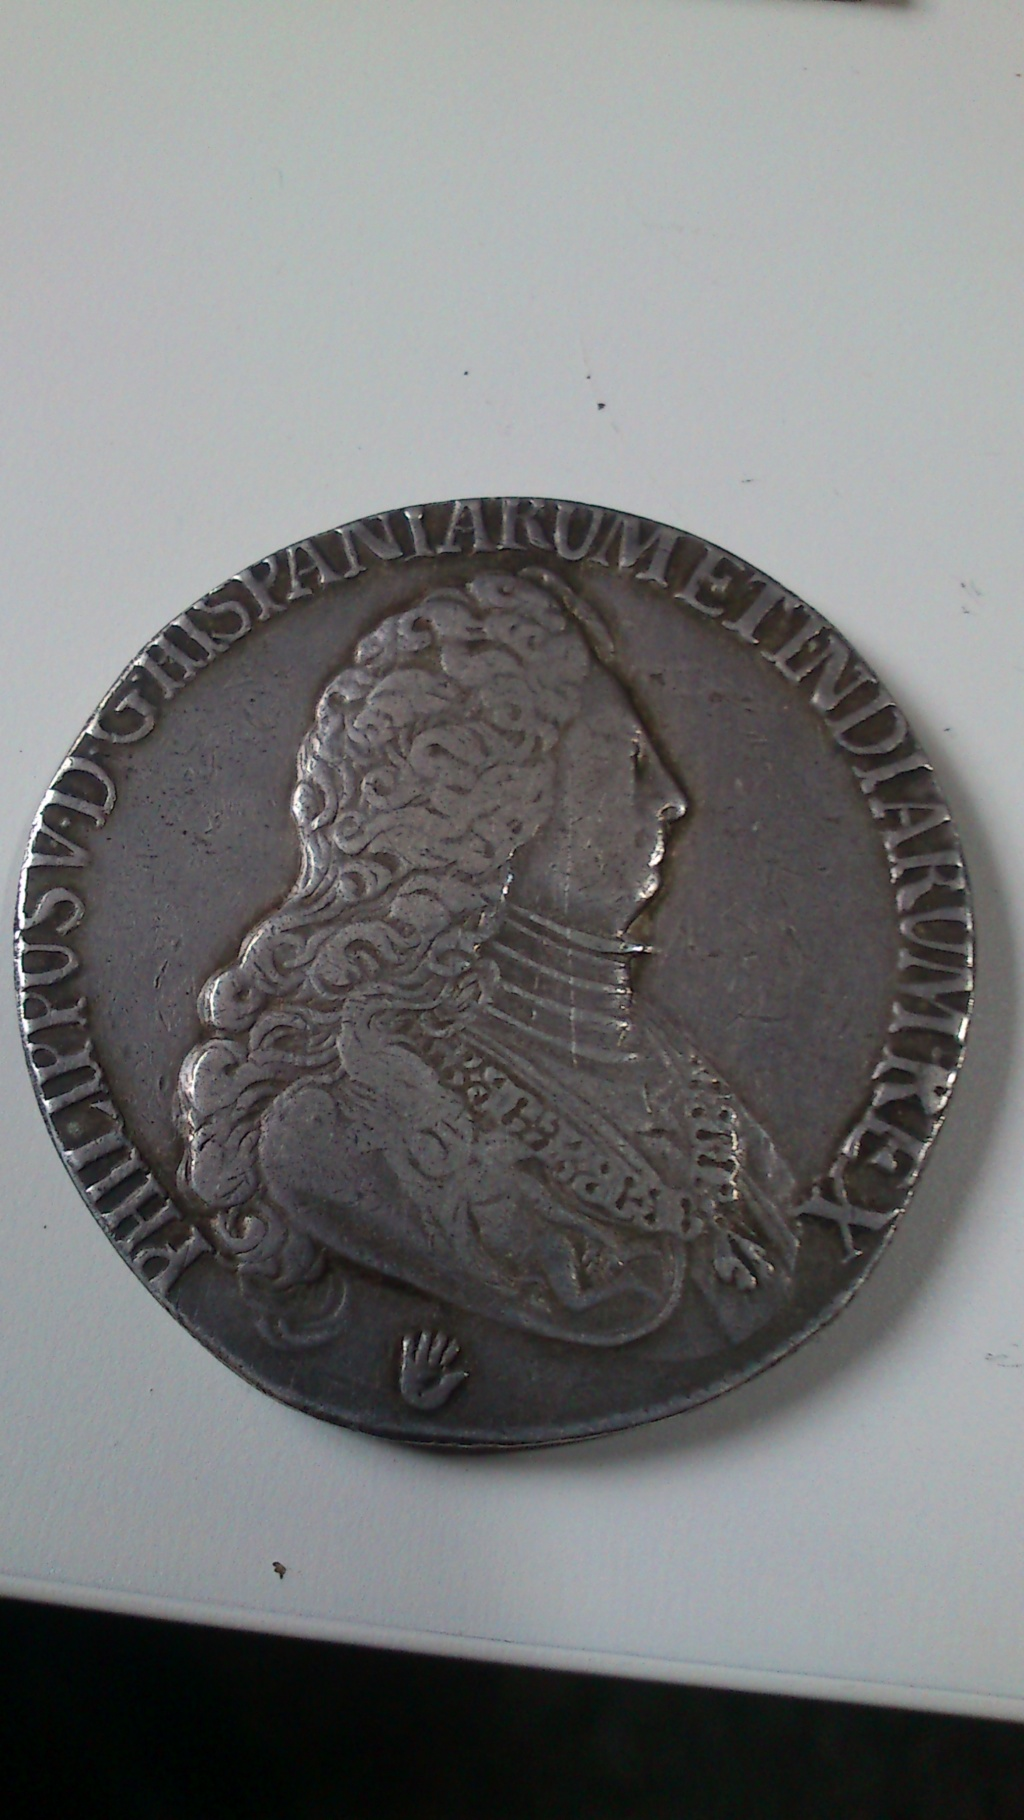 DUCATON  de Felipe V Brabante (Amberes) 1703 Dsc_0029